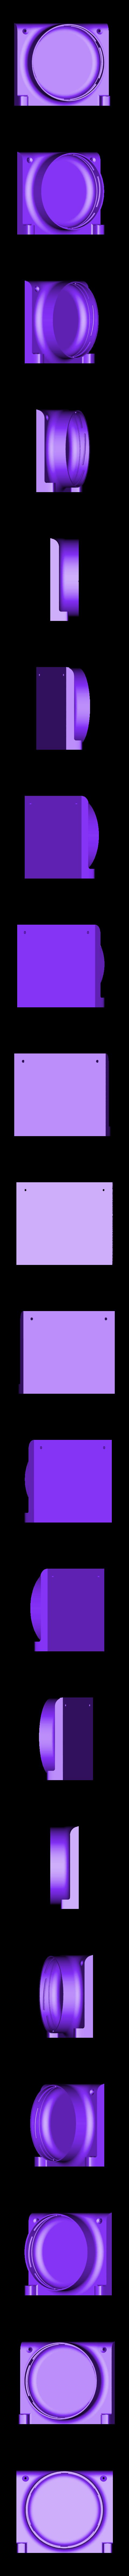 porte pot1.1.stl Télécharger fichier STL gratuit Hanging jar holder • Design à imprimer en 3D, Barbe_Iturique